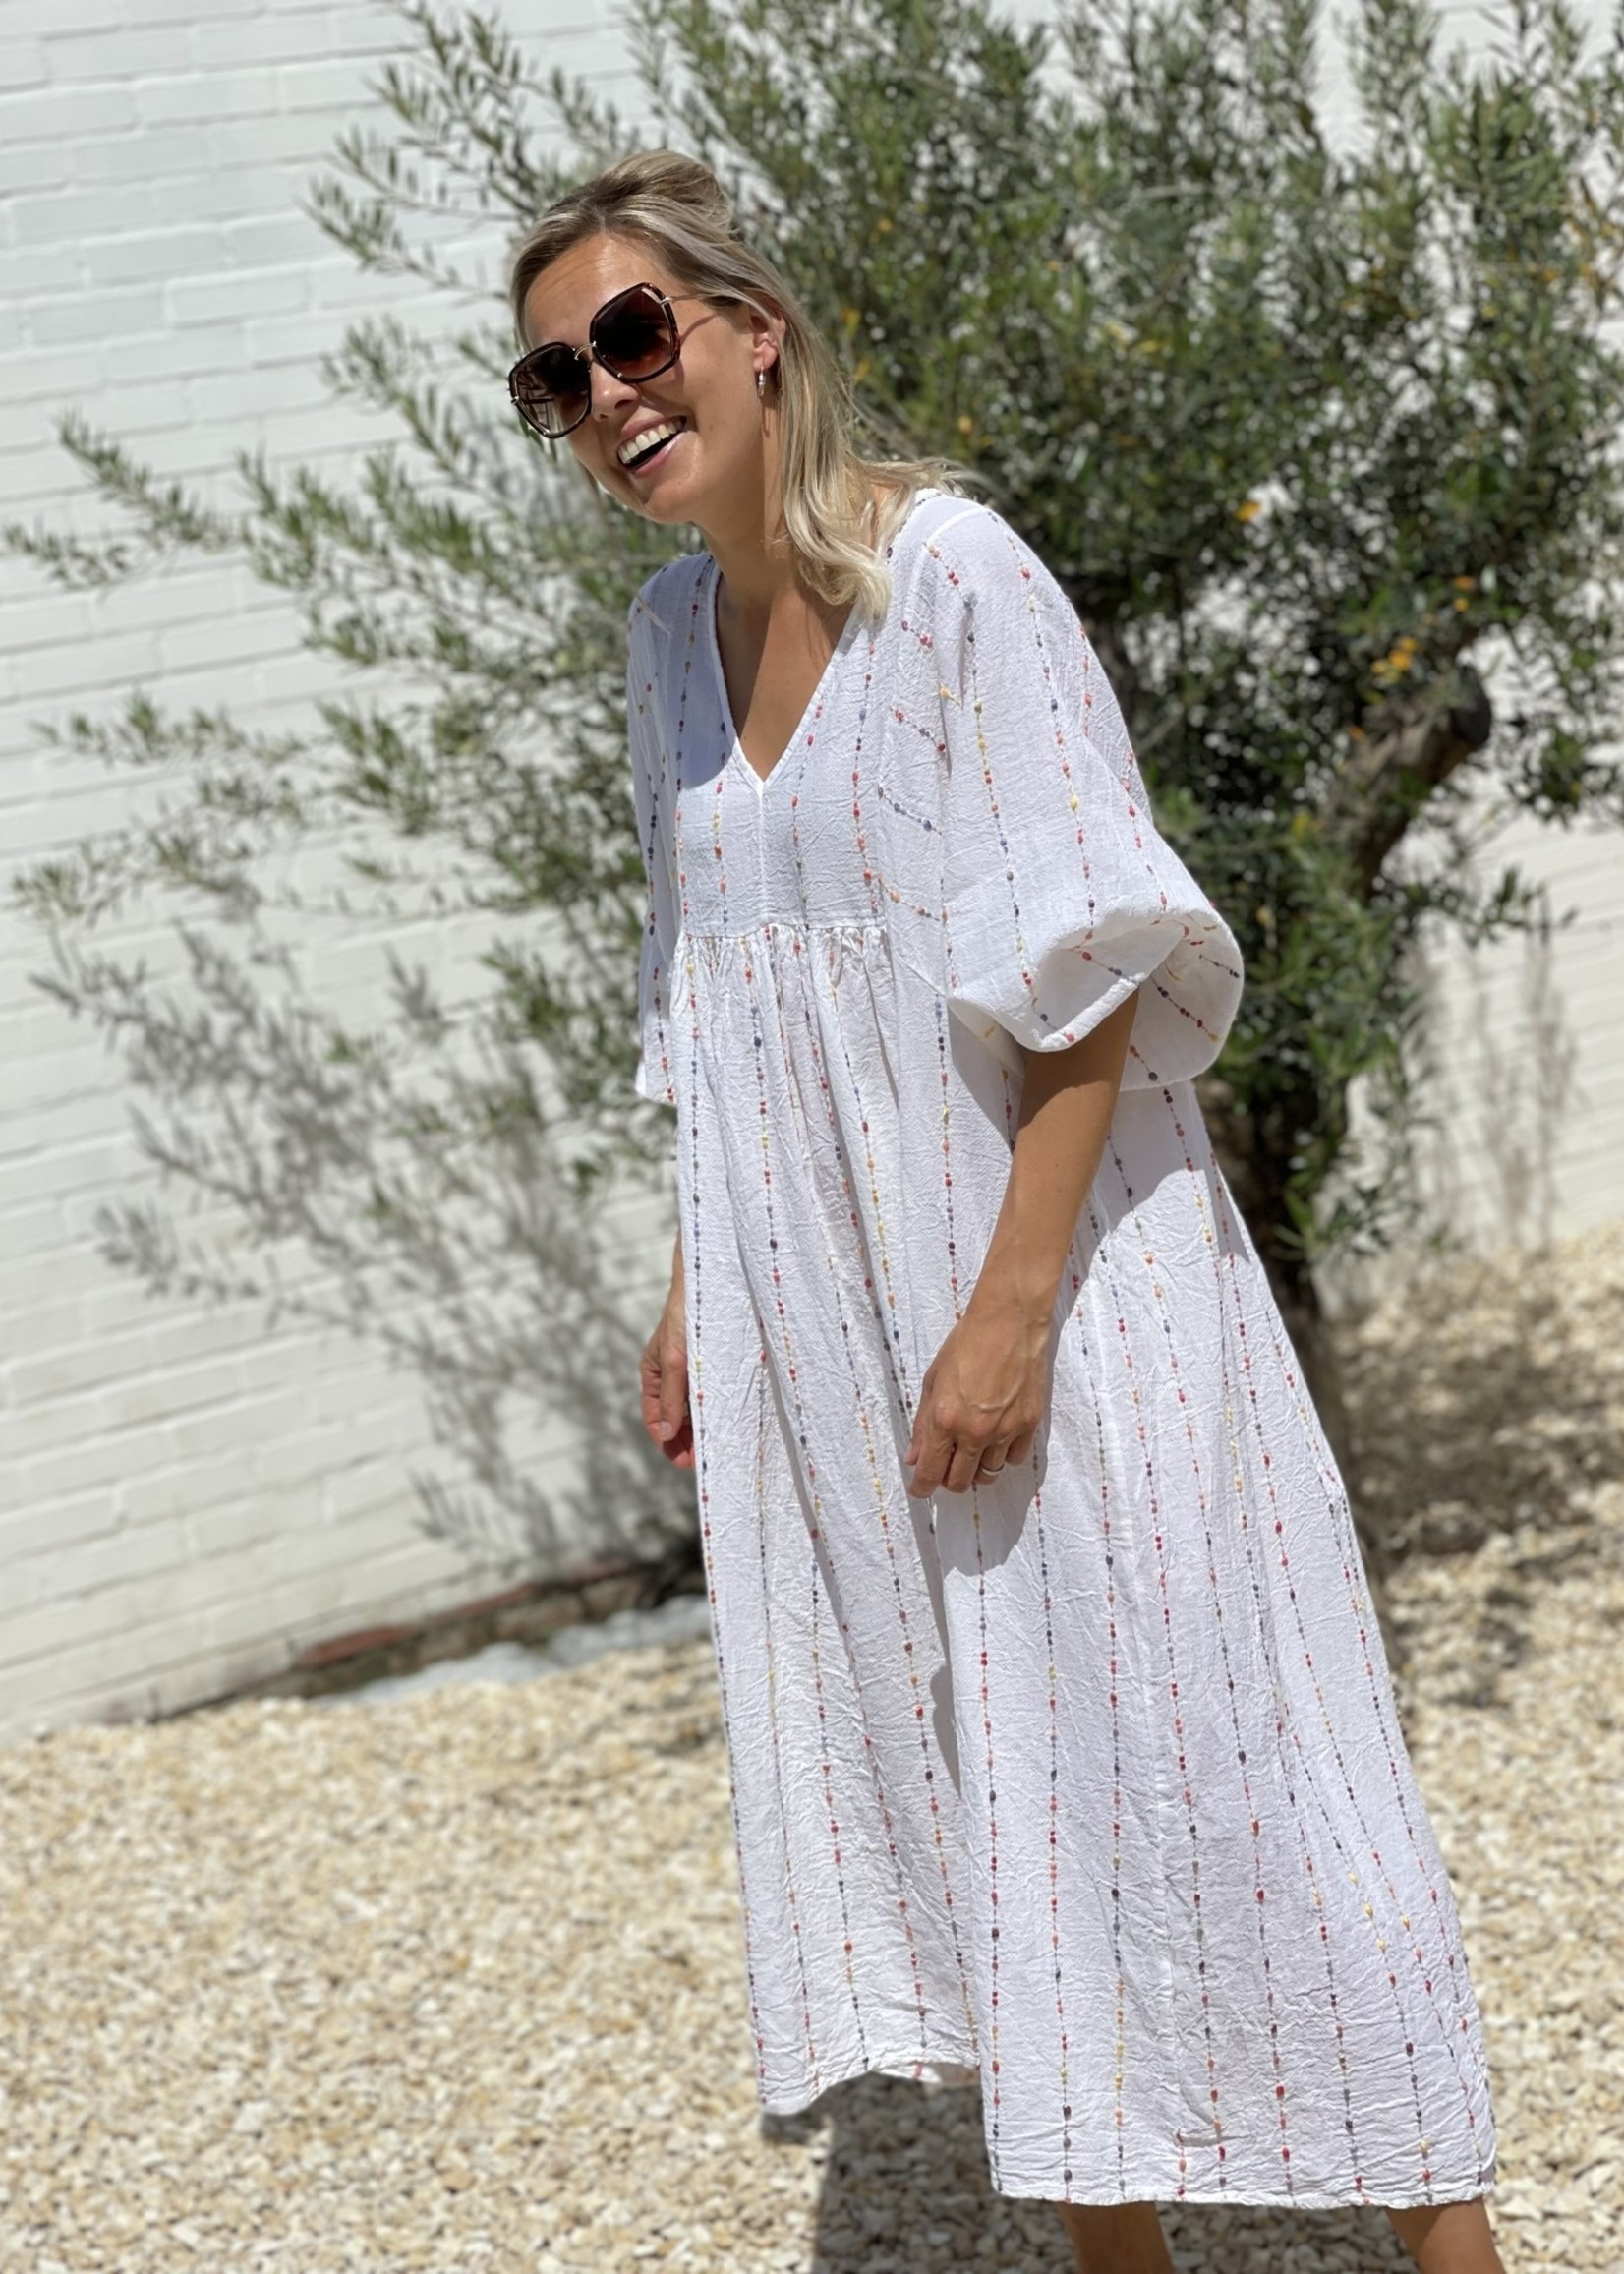 Guts & Goats Vivienne White Dress